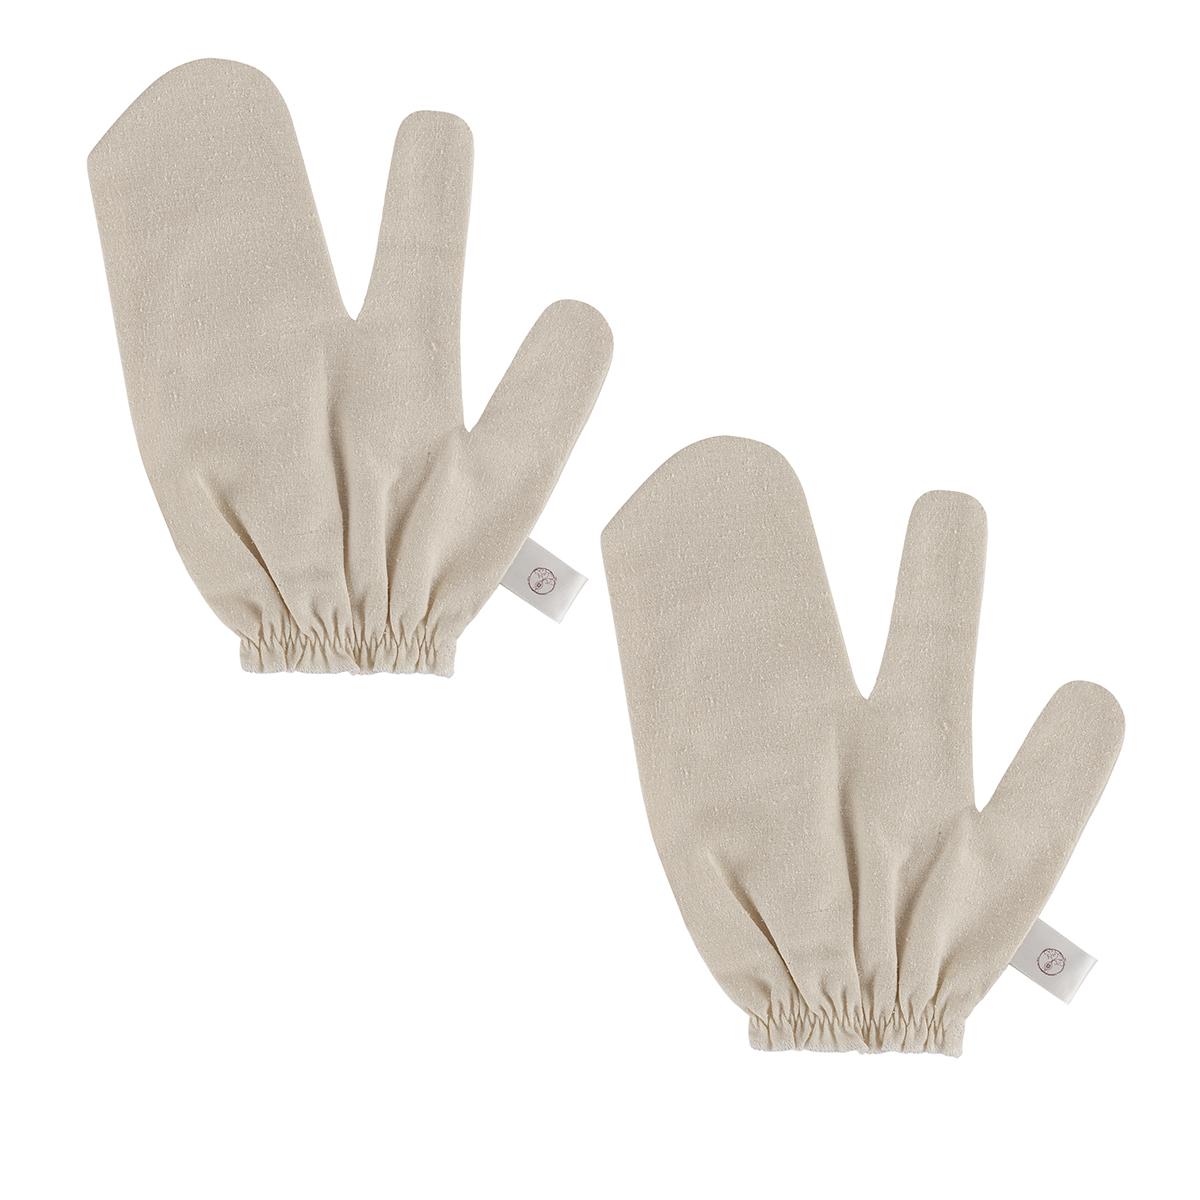 Garshana gloves 100% raw silk - Sayoni Care